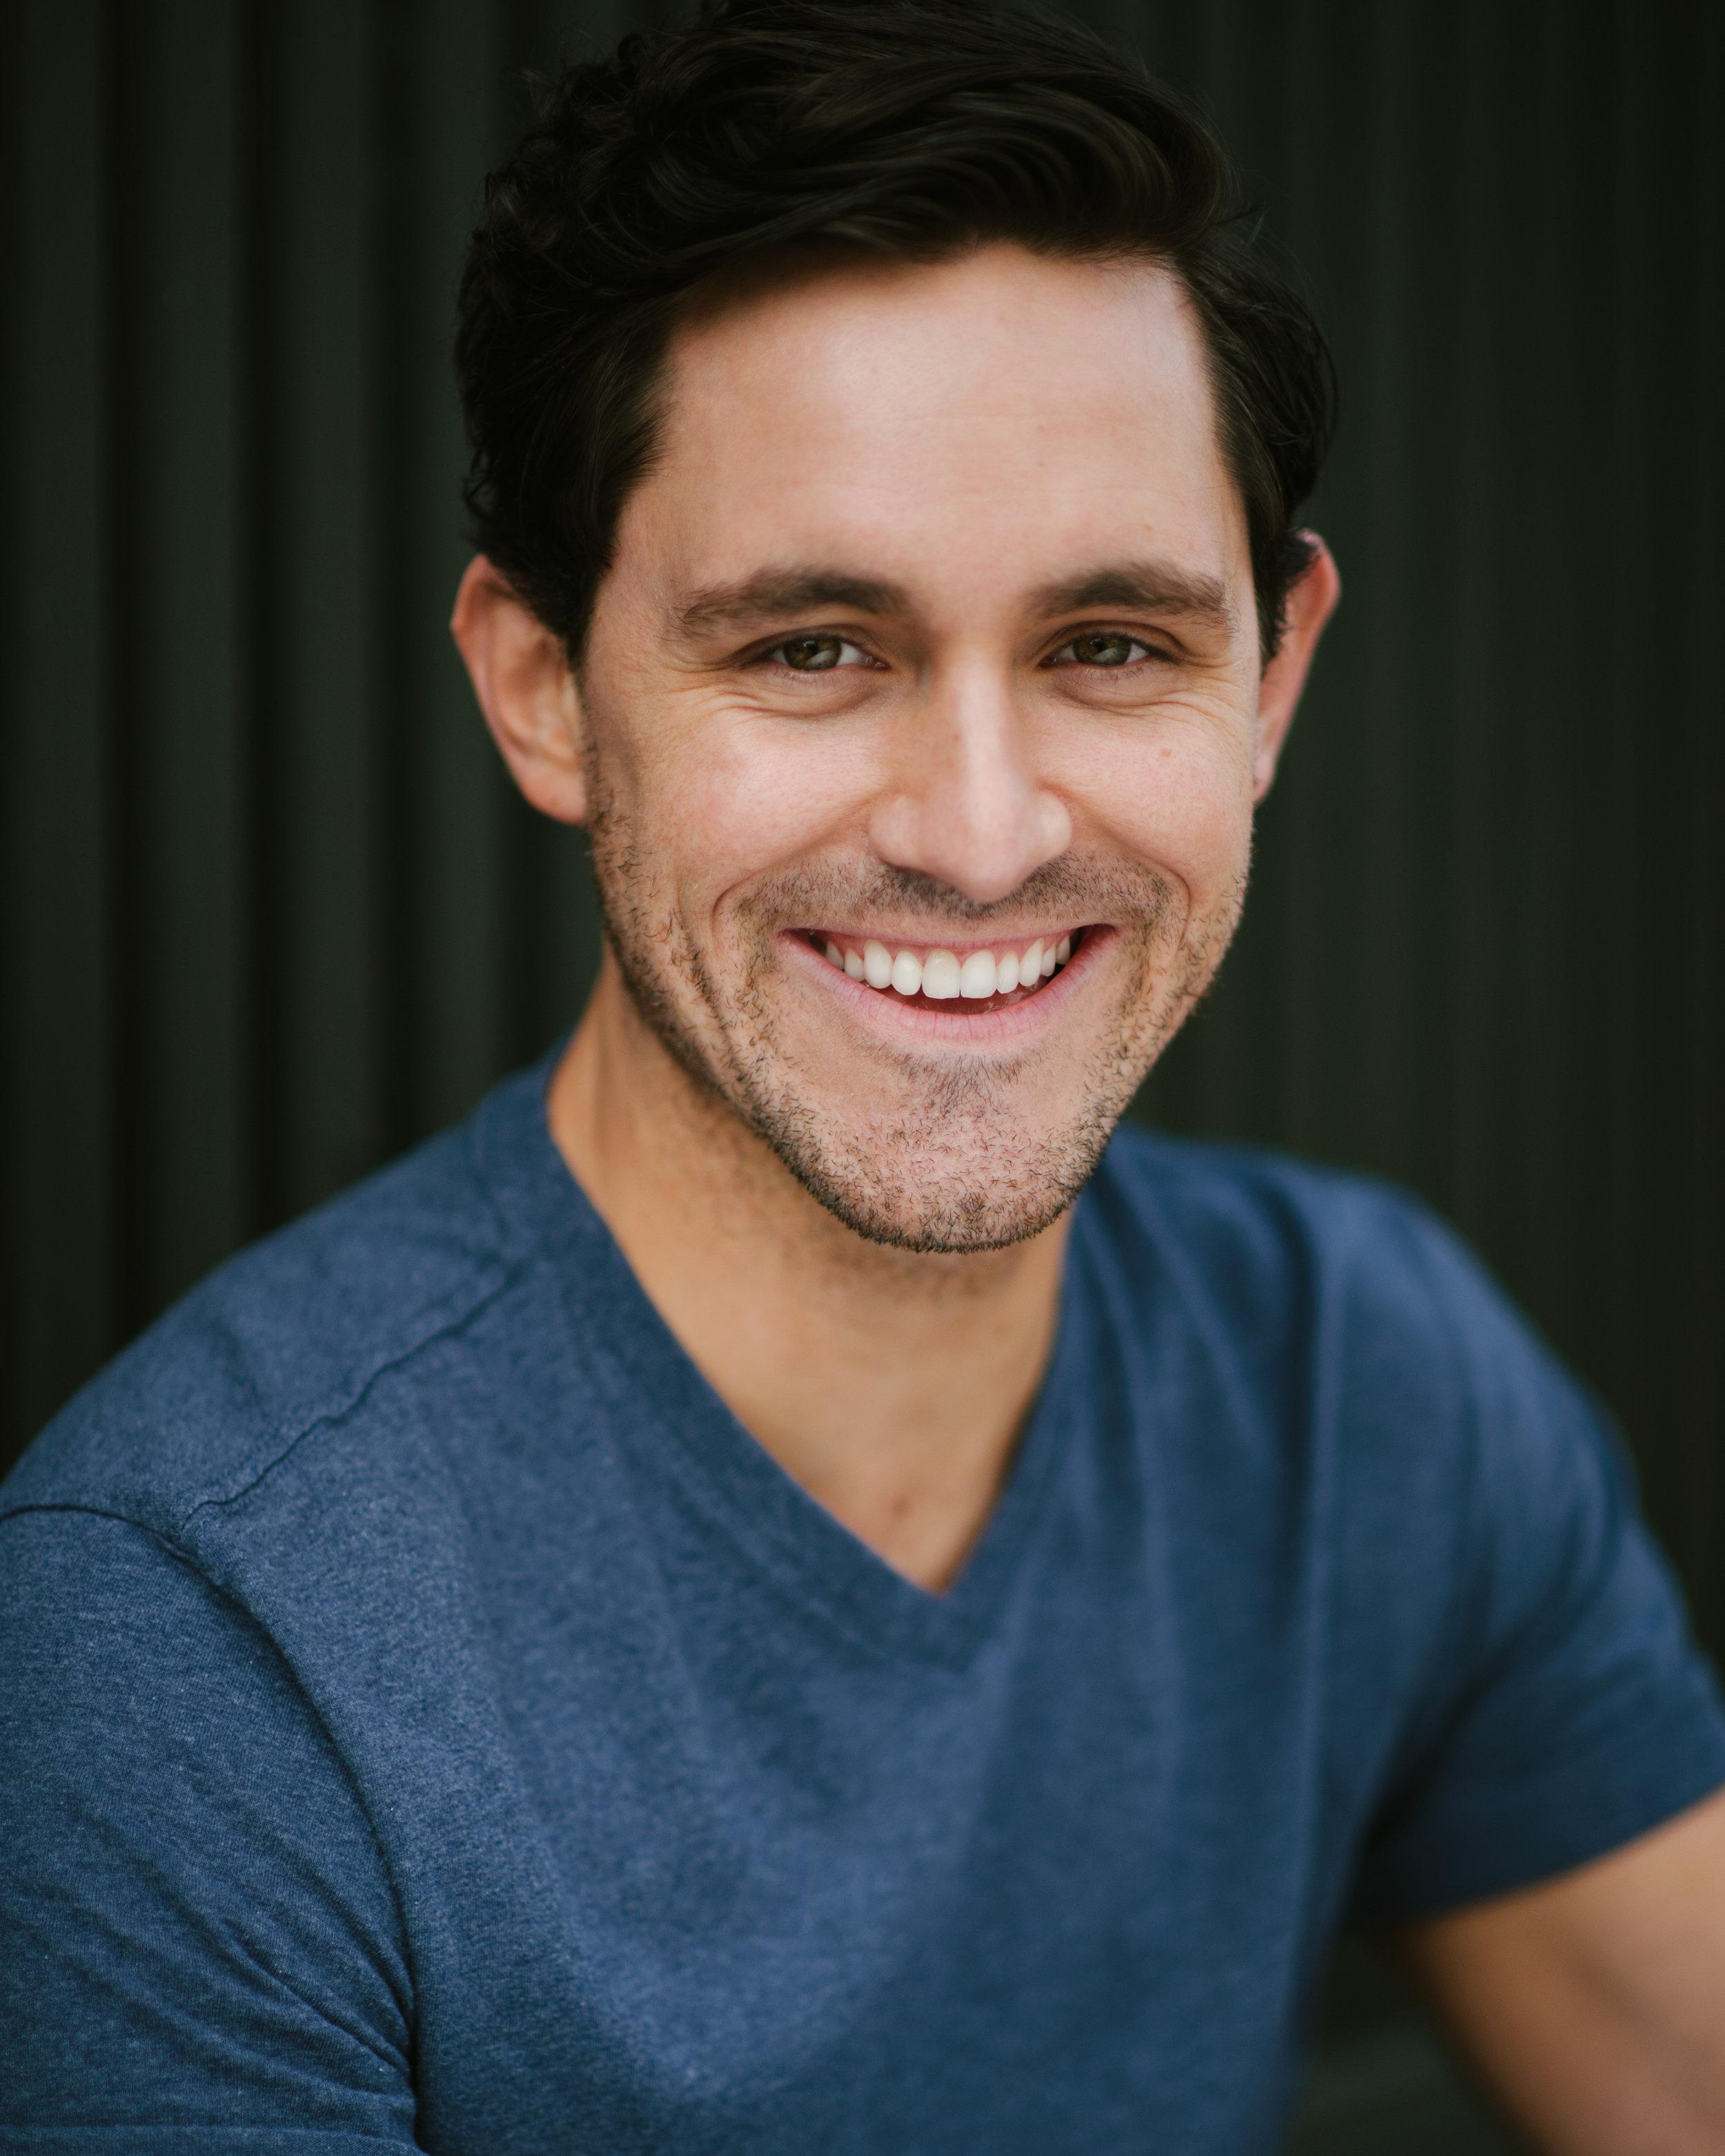 Jordan Fraser-Trumble | Actor